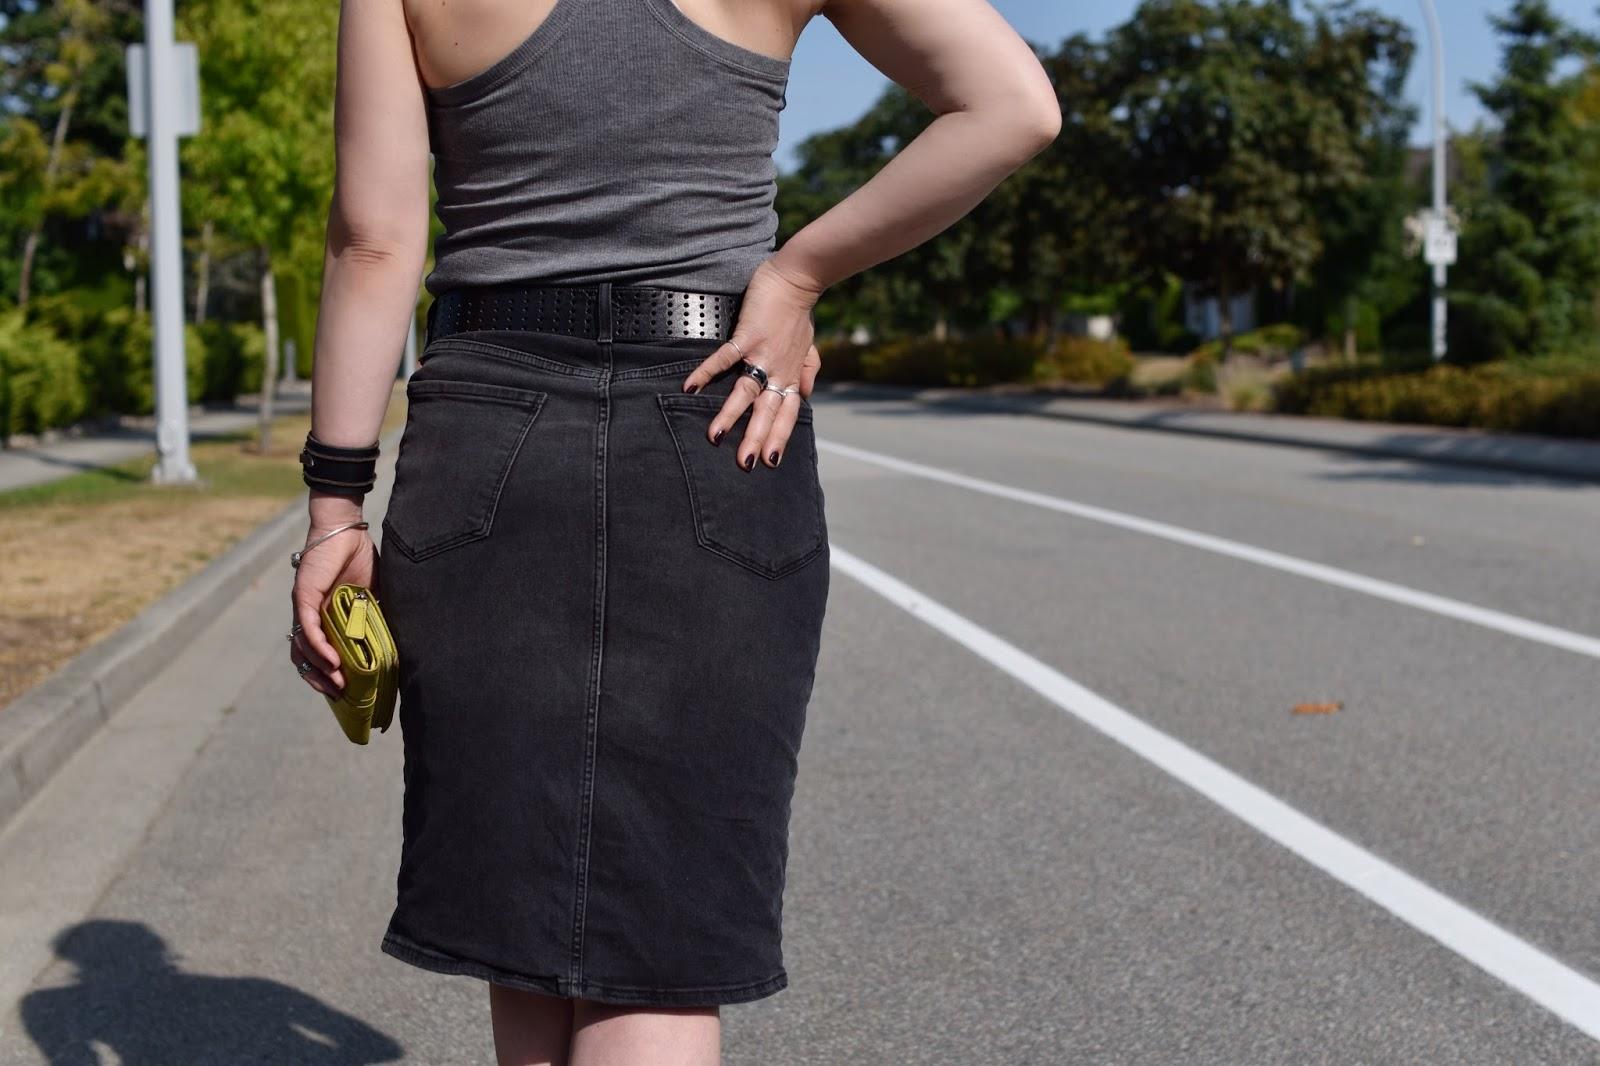 Monika Faulkner outfit inspiration - grey racerback tank top, black denim pencil skirt